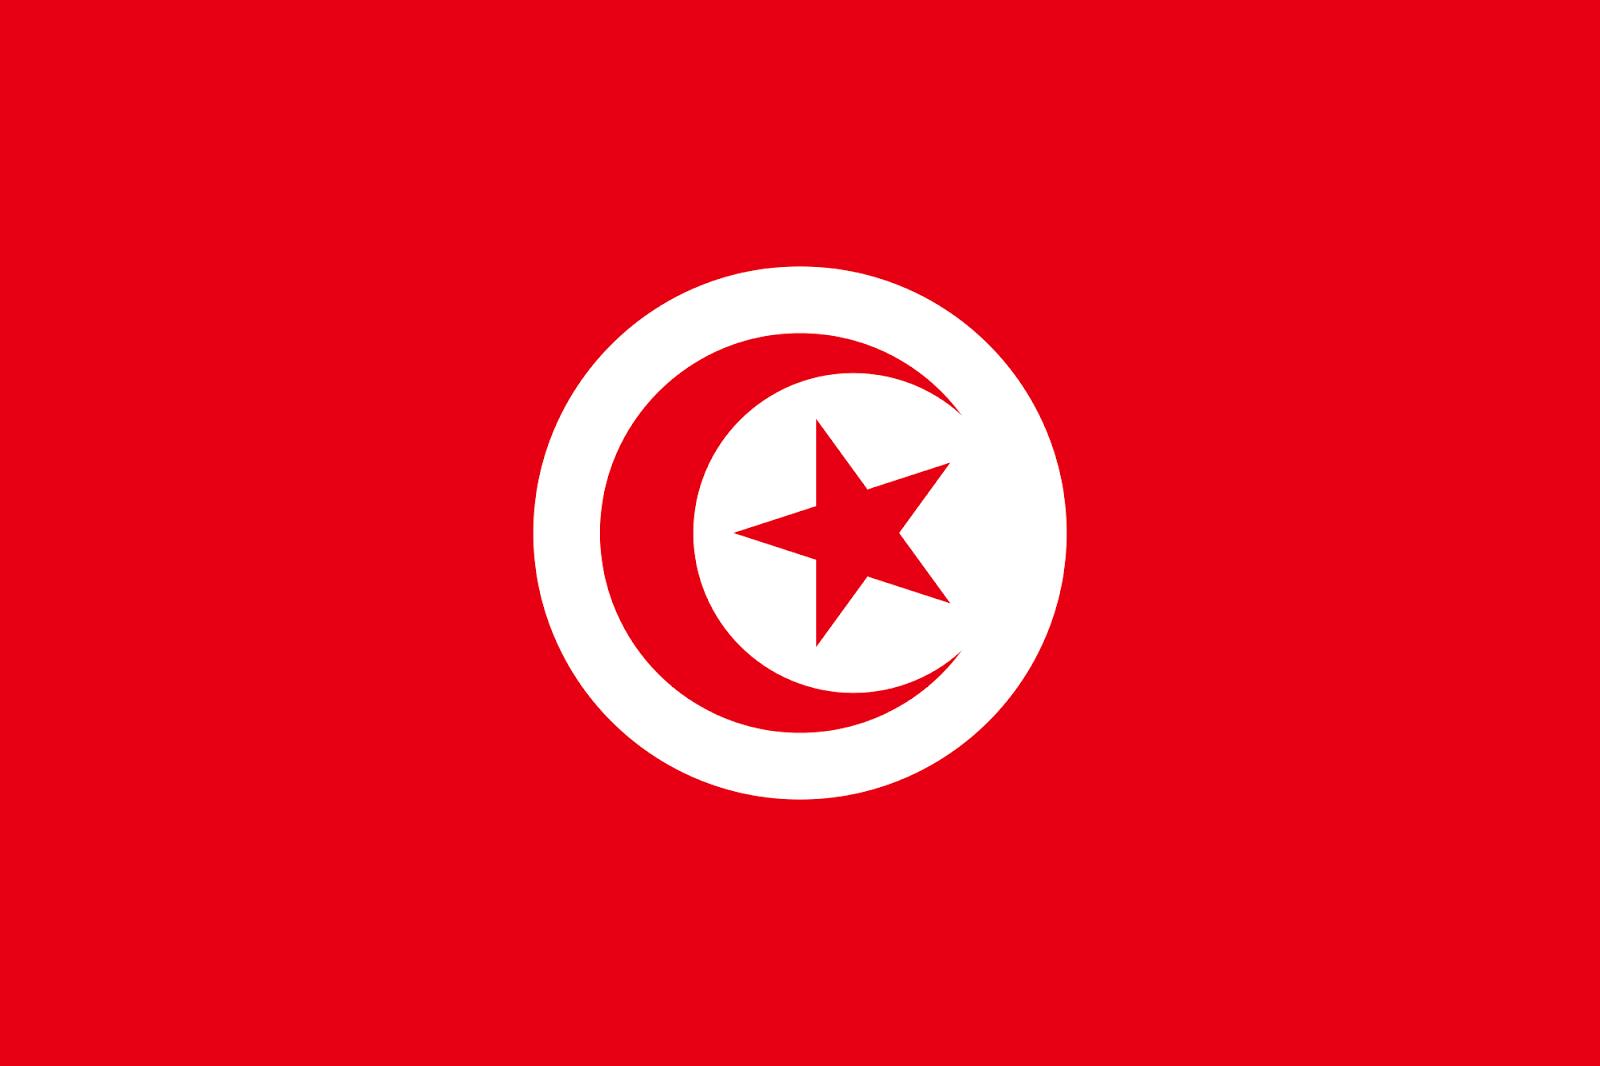 http://carbrandsincurrentproduction.blogspot.com.es/search/label/Tunisia